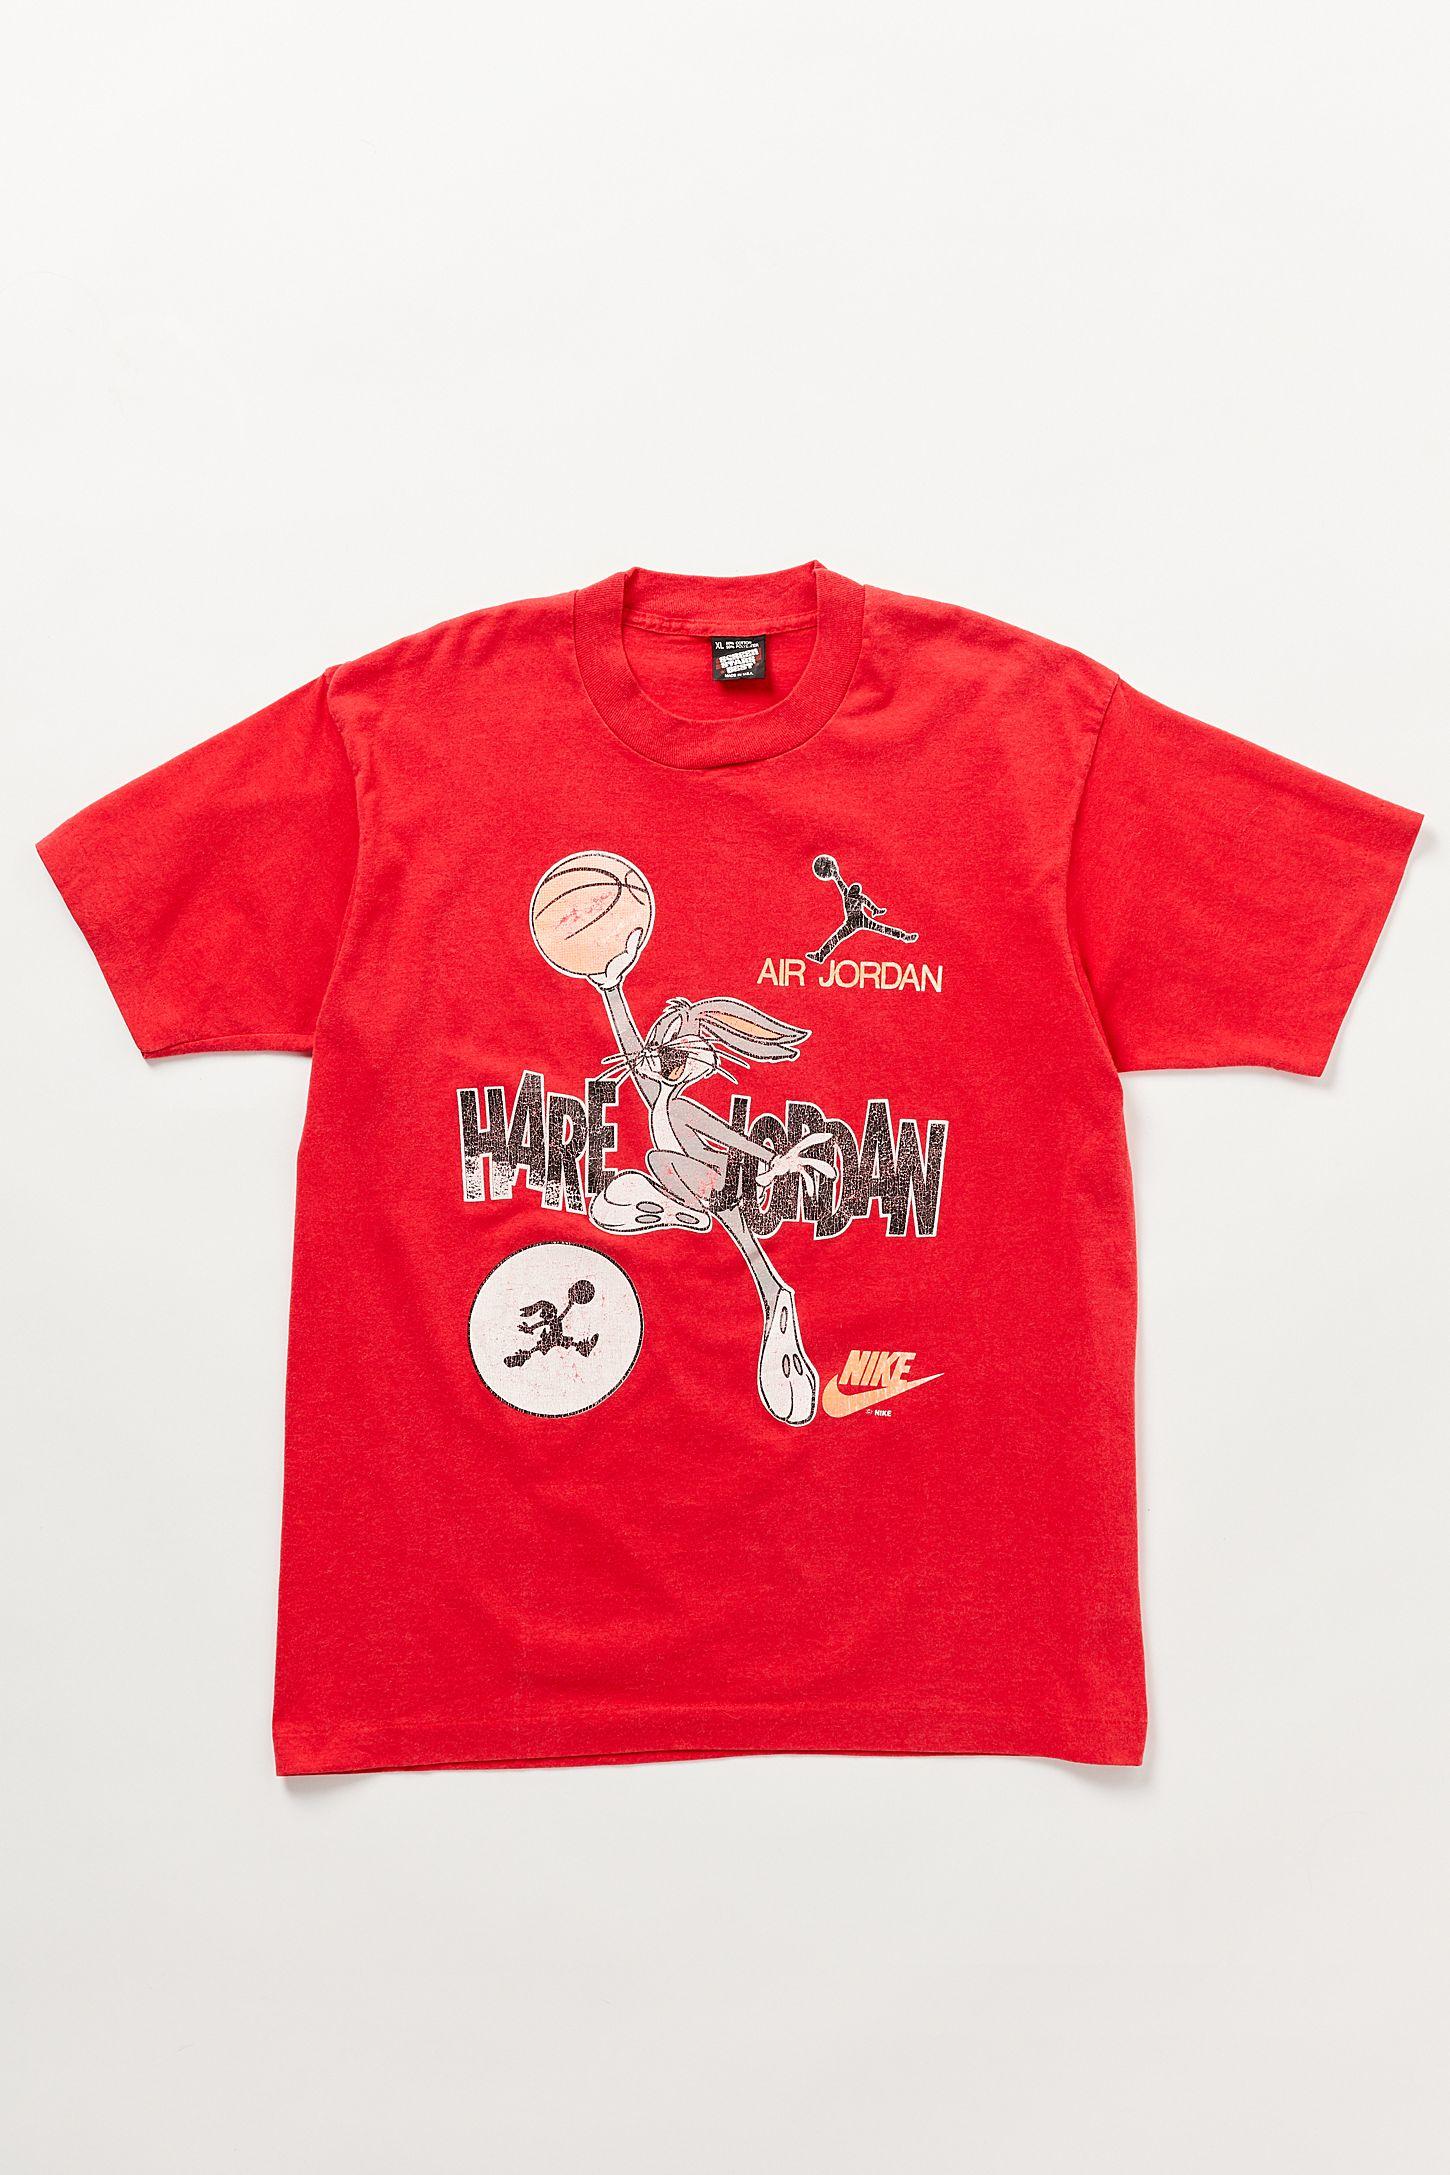 9069f2025b1 Vintage Hare Jordan Tee | Urban Outfitters